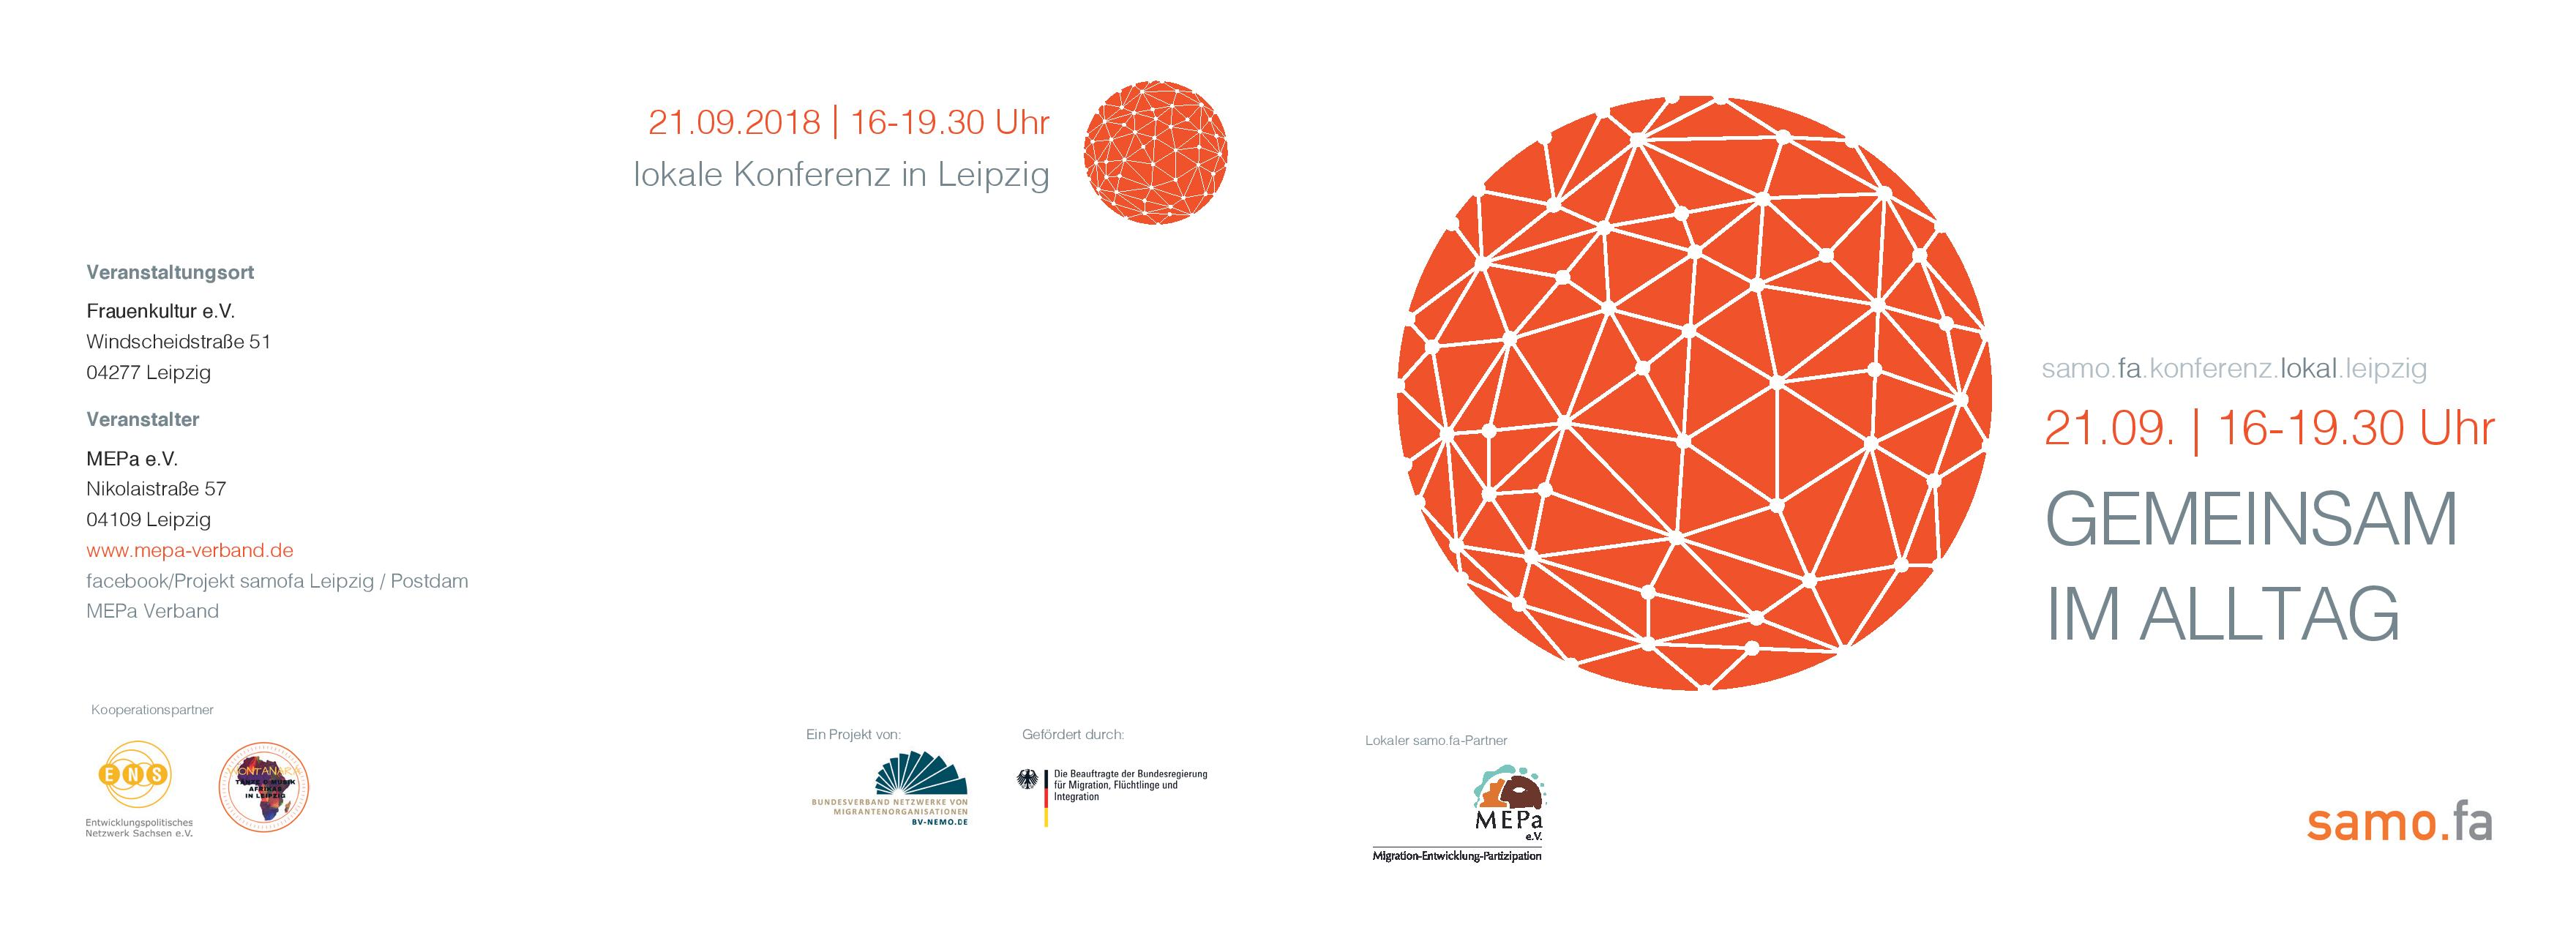 samofa konferenz leipzig flyer LAY02-page-001.jpg